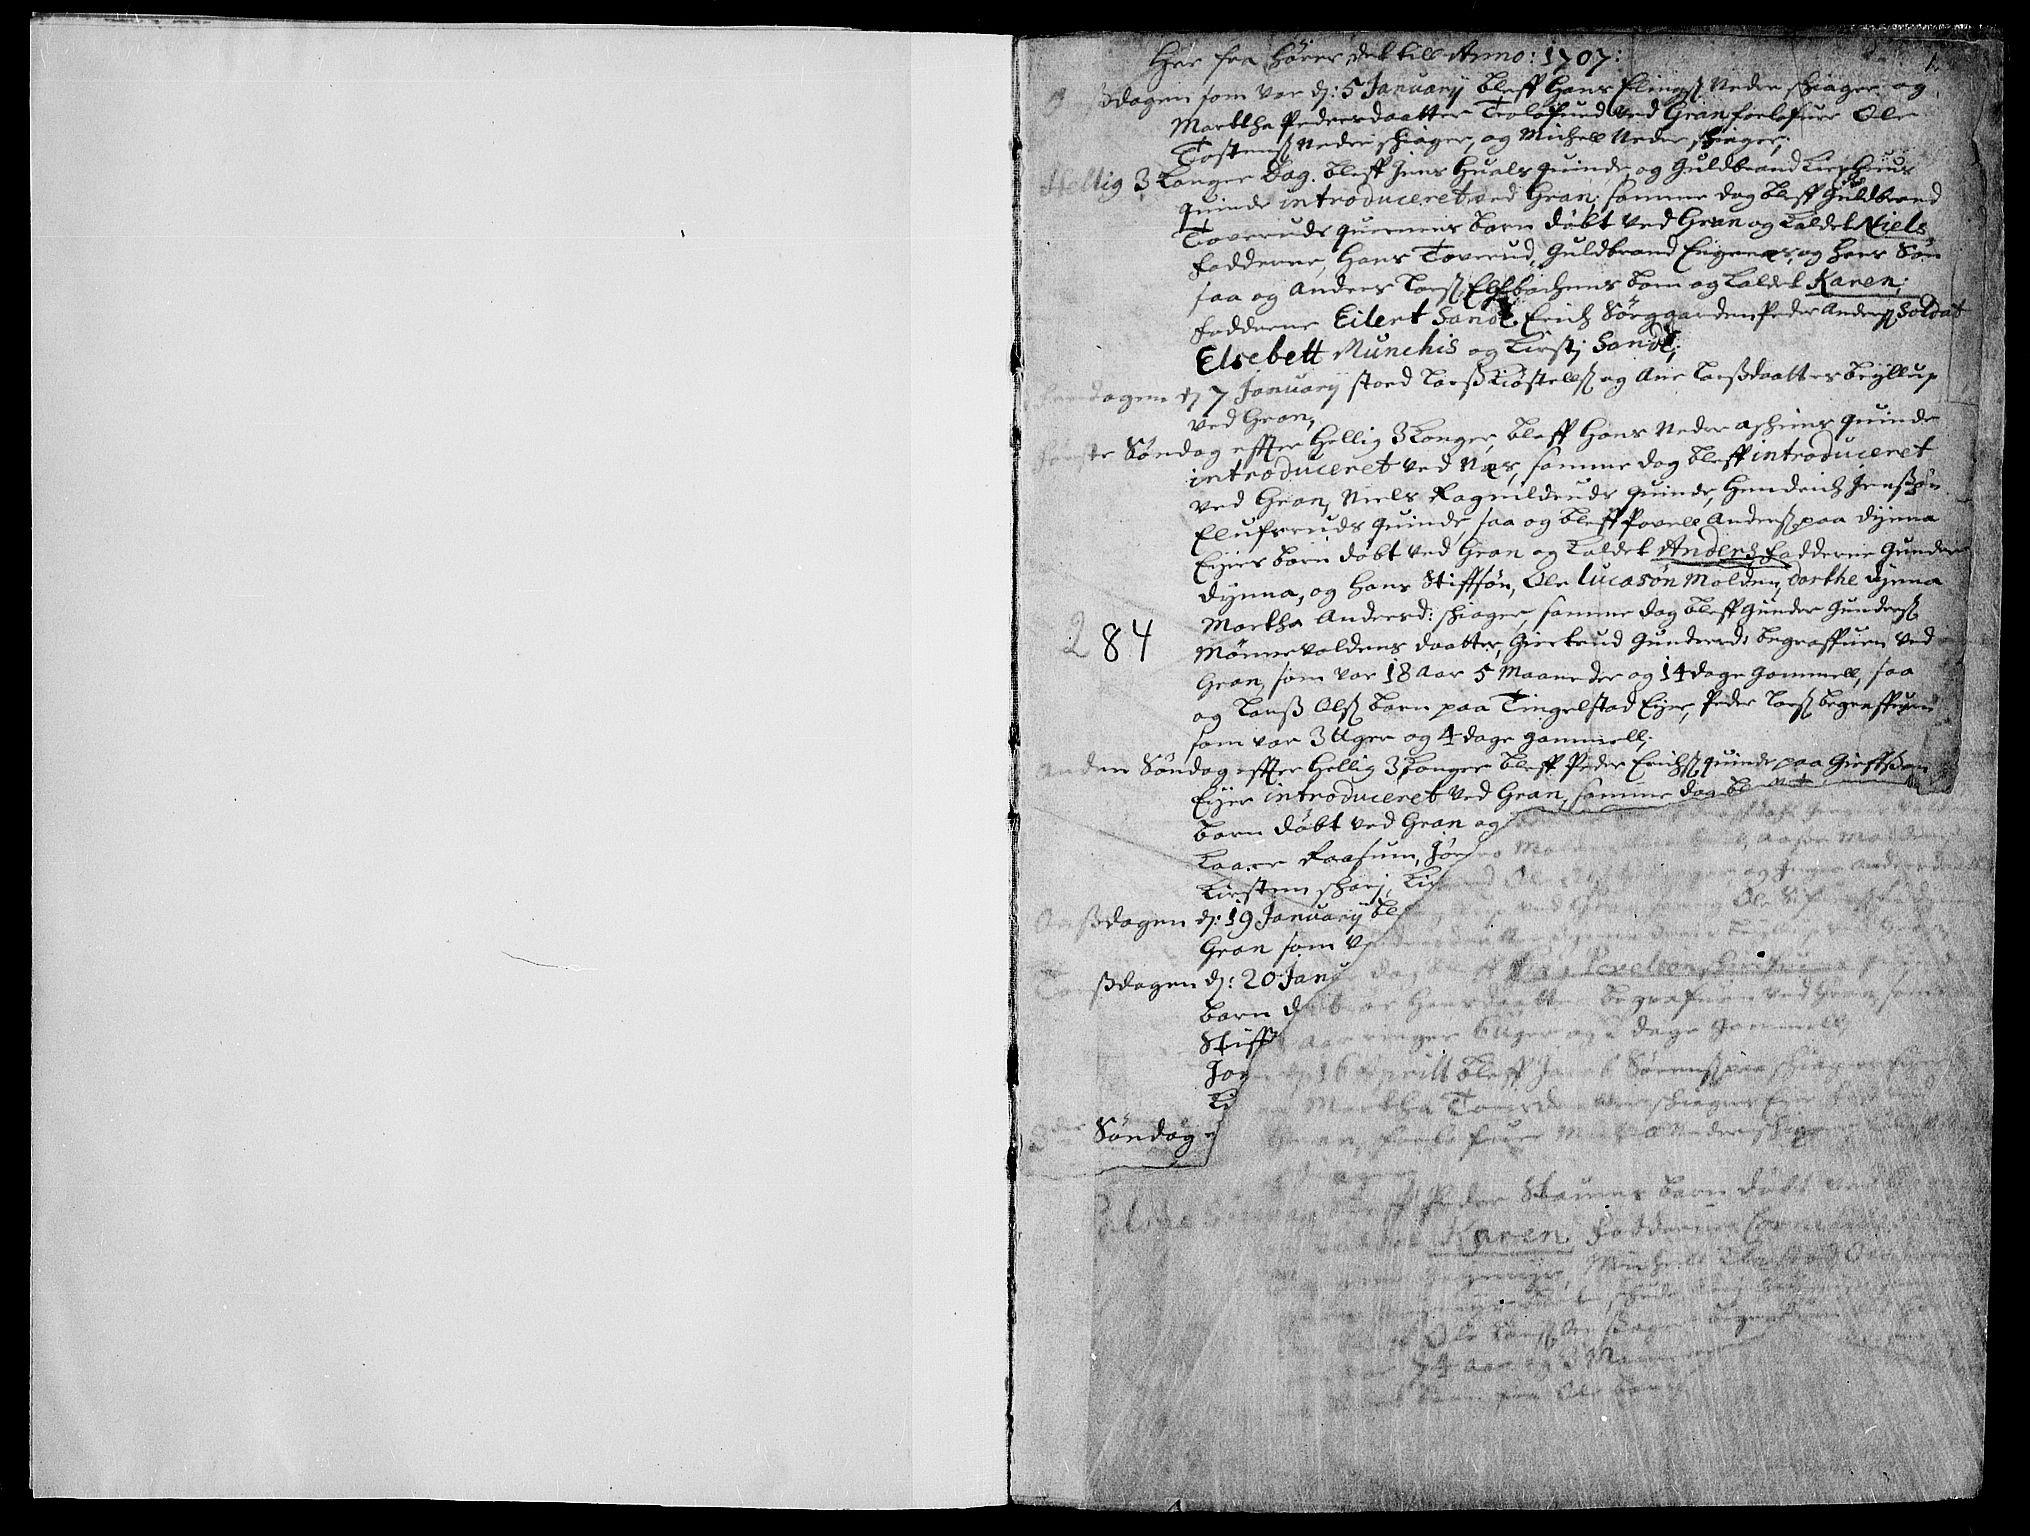 SAH, Gran prestekontor, Ministerialbok nr. 1, 1707-1731, s. 1